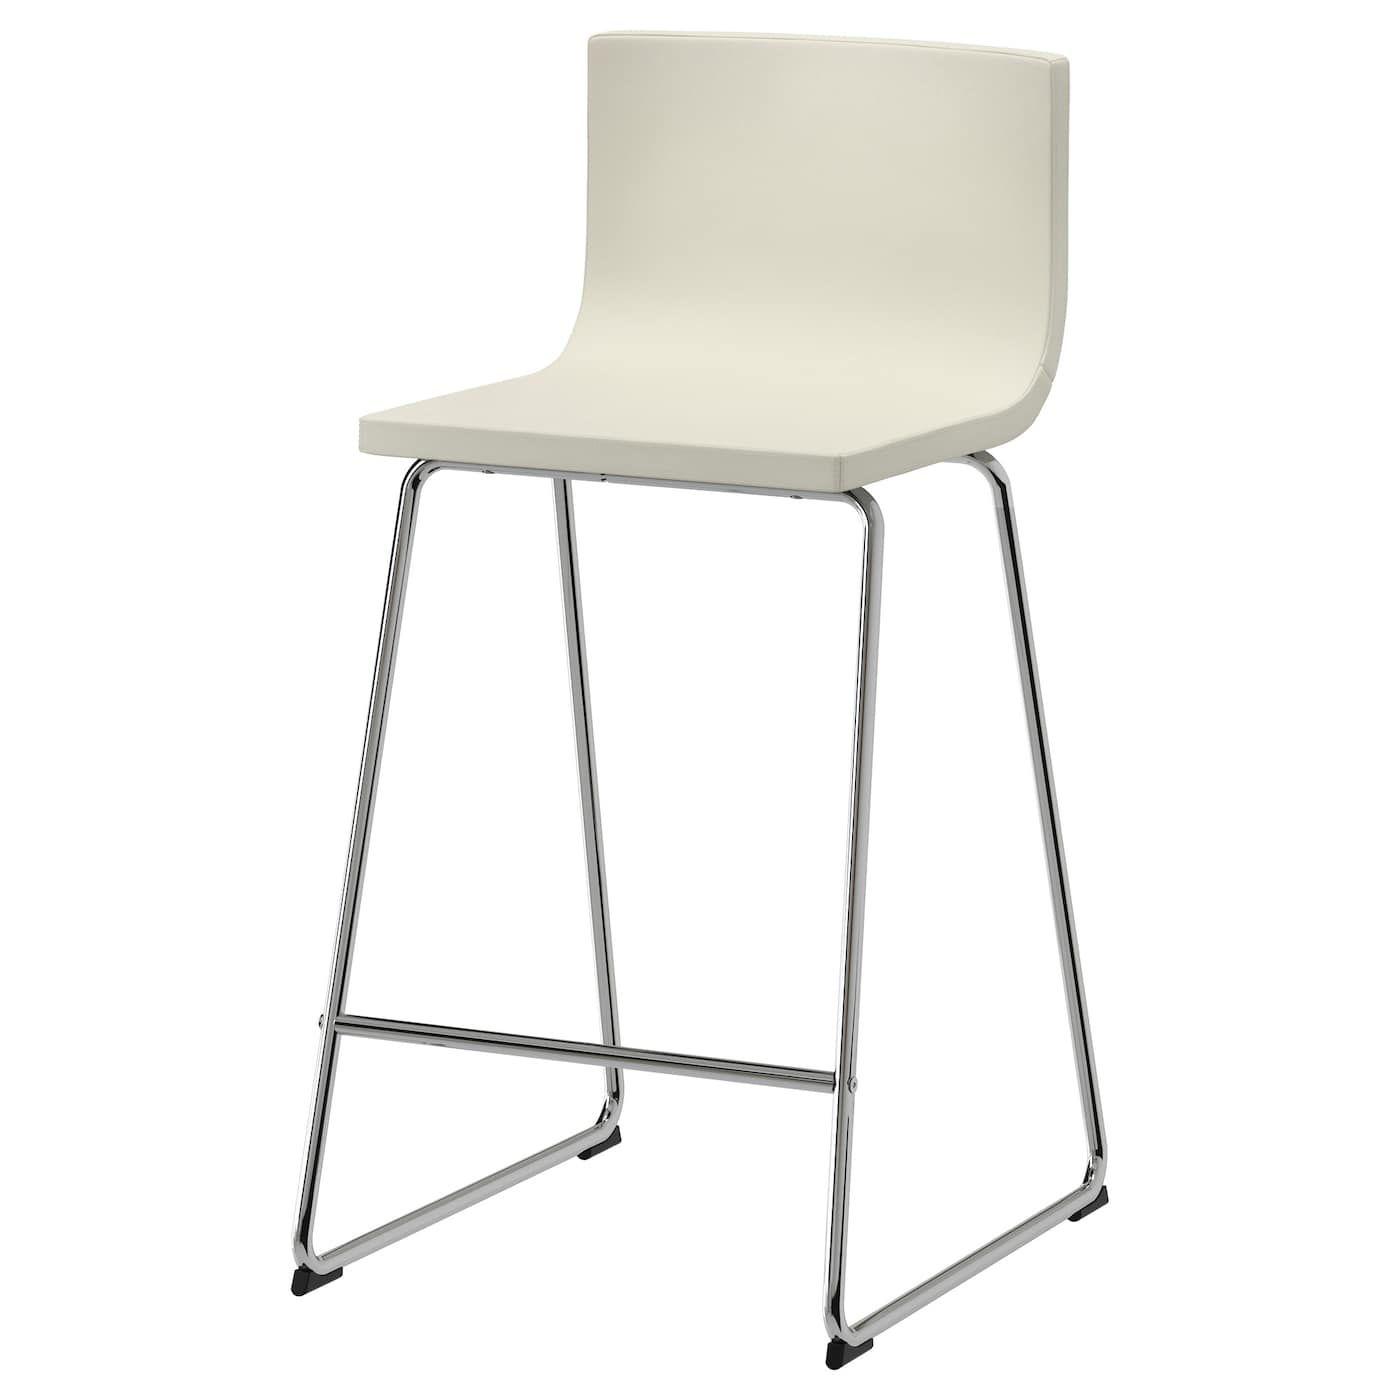 Bernhard Bar Stool With Backrest Chrome Plated Mjuk Kavat White 26 With Images Cool Bar Stools Bar Stool Chairs Ikea Bar